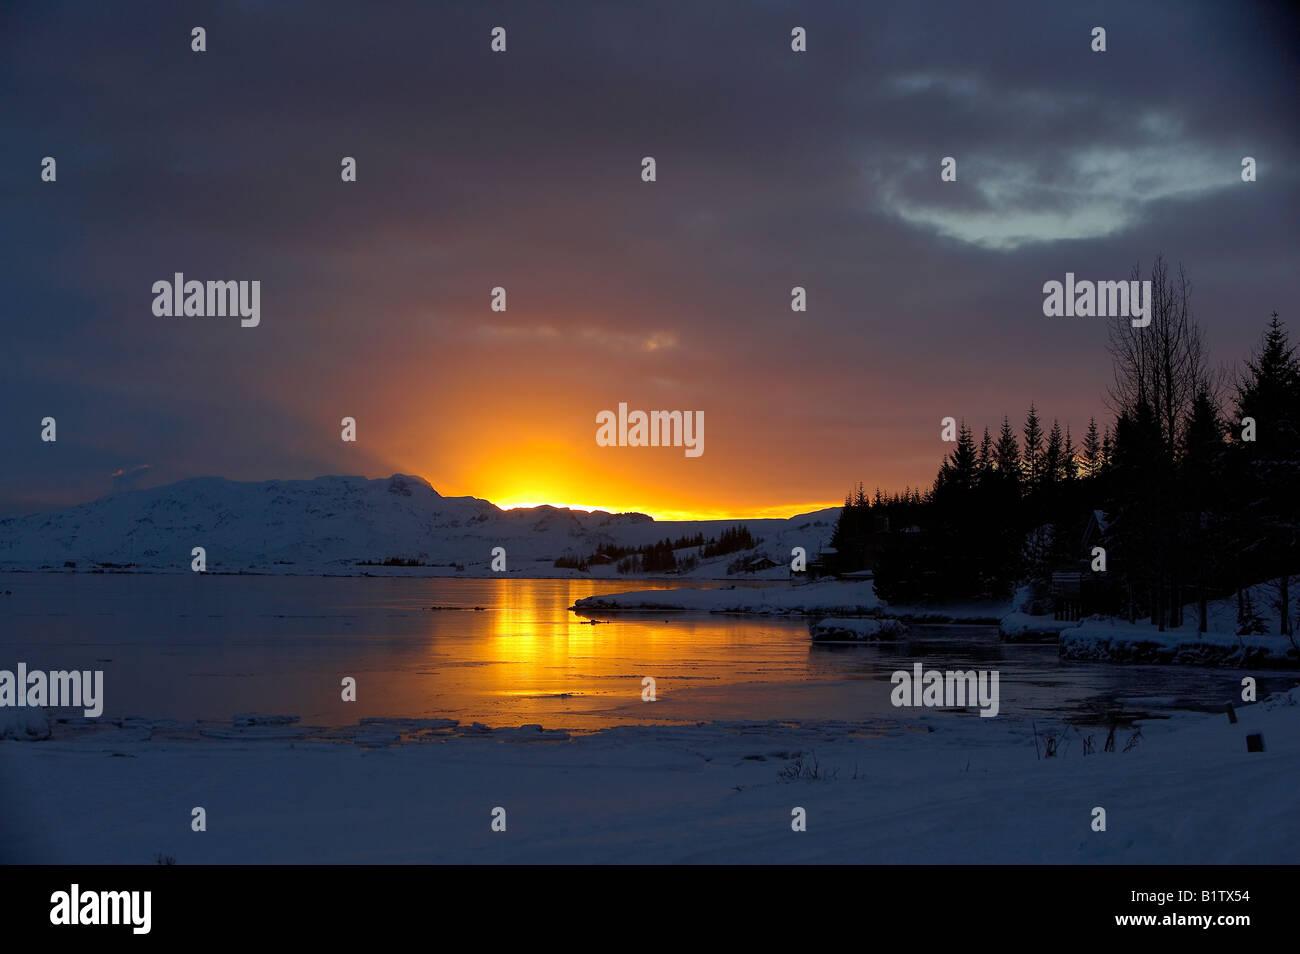 Atardecer en el Parque Nacional Thingvellir, Lago Thingvellirvatn, Islandia Imagen De Stock